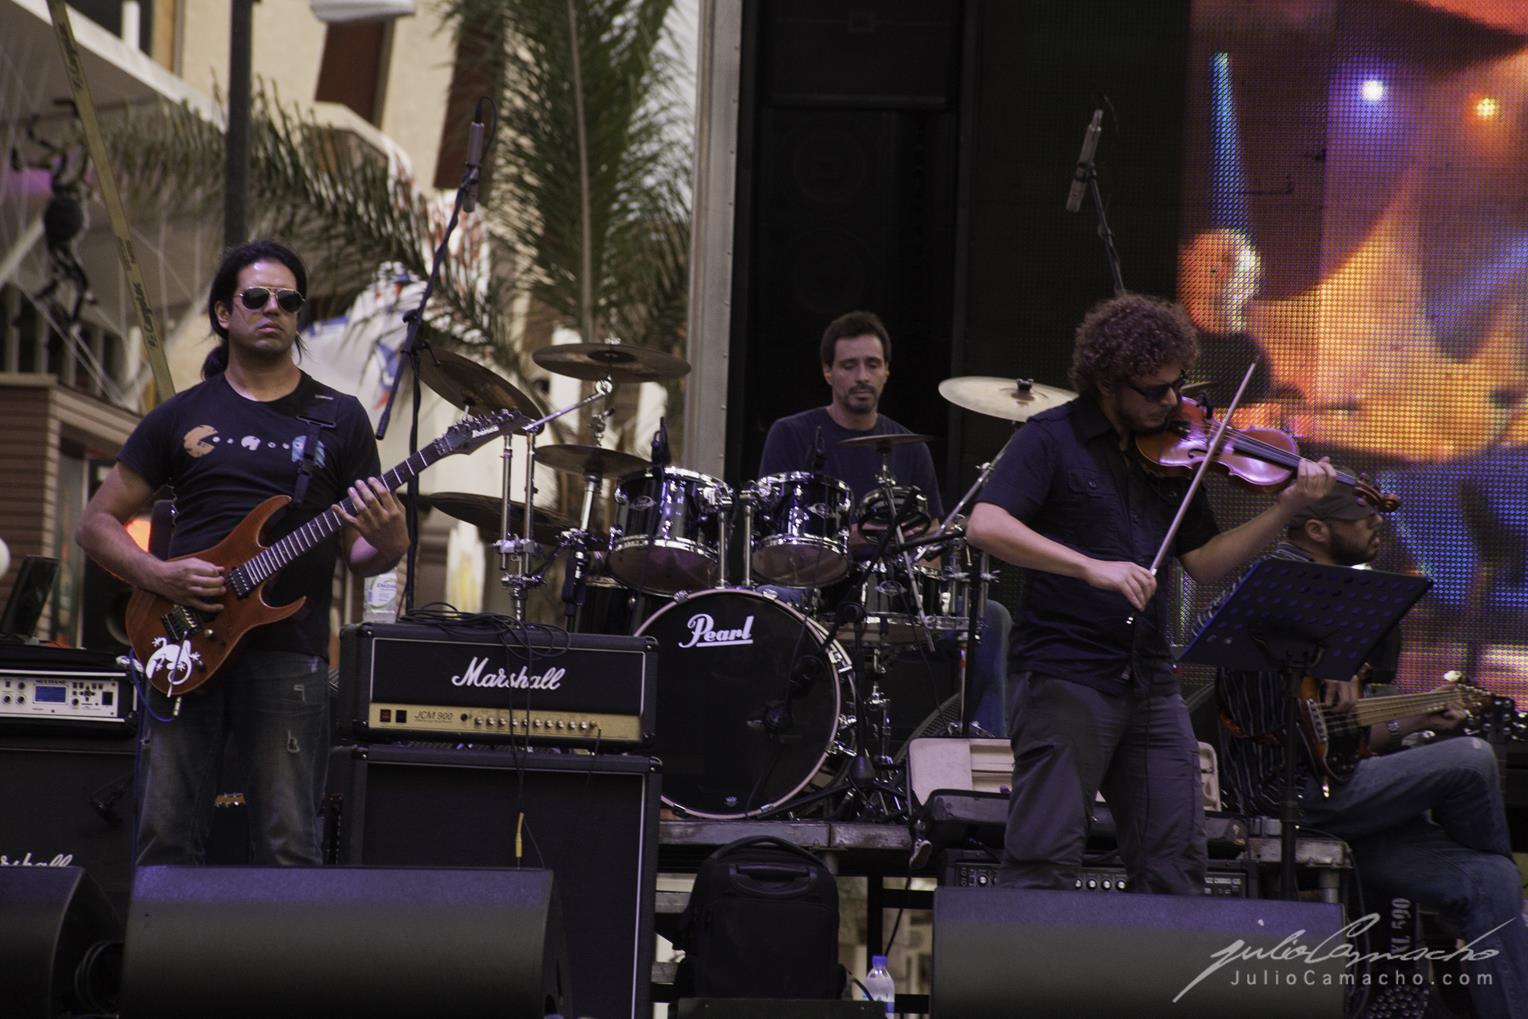 2014-10-30 31 CAST TOUR Ensenada y Tijuana - 1188 - www.Juli (Copy).jpg